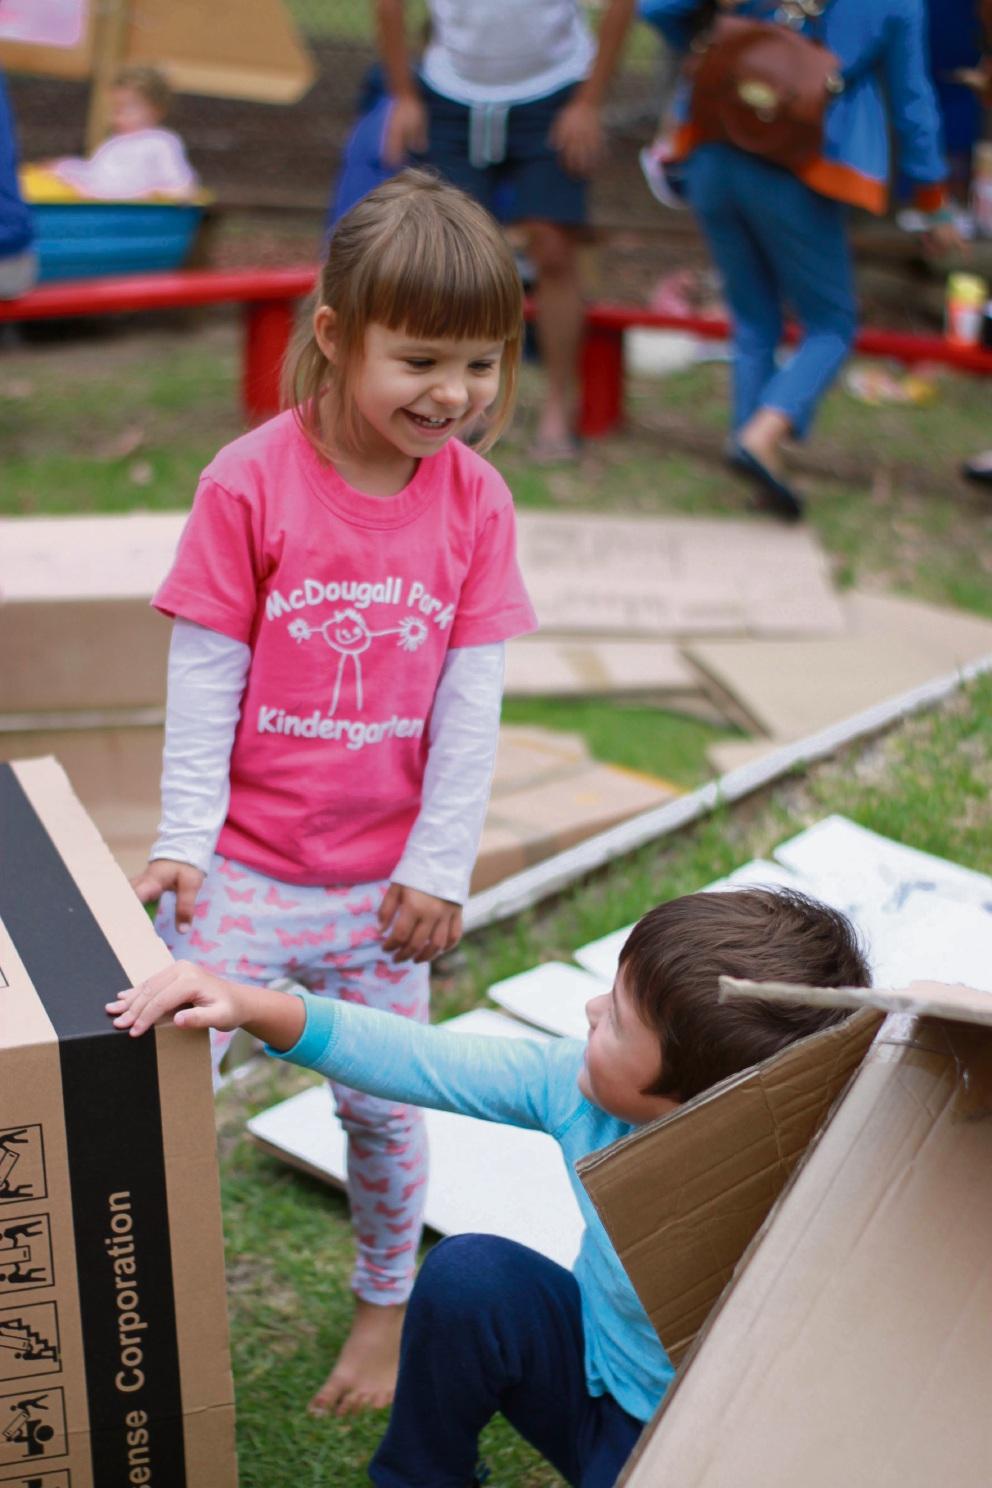 McDougall Park Community Kindergarten Students Carla Czech and Isaac Court enjoy Cardboard City.